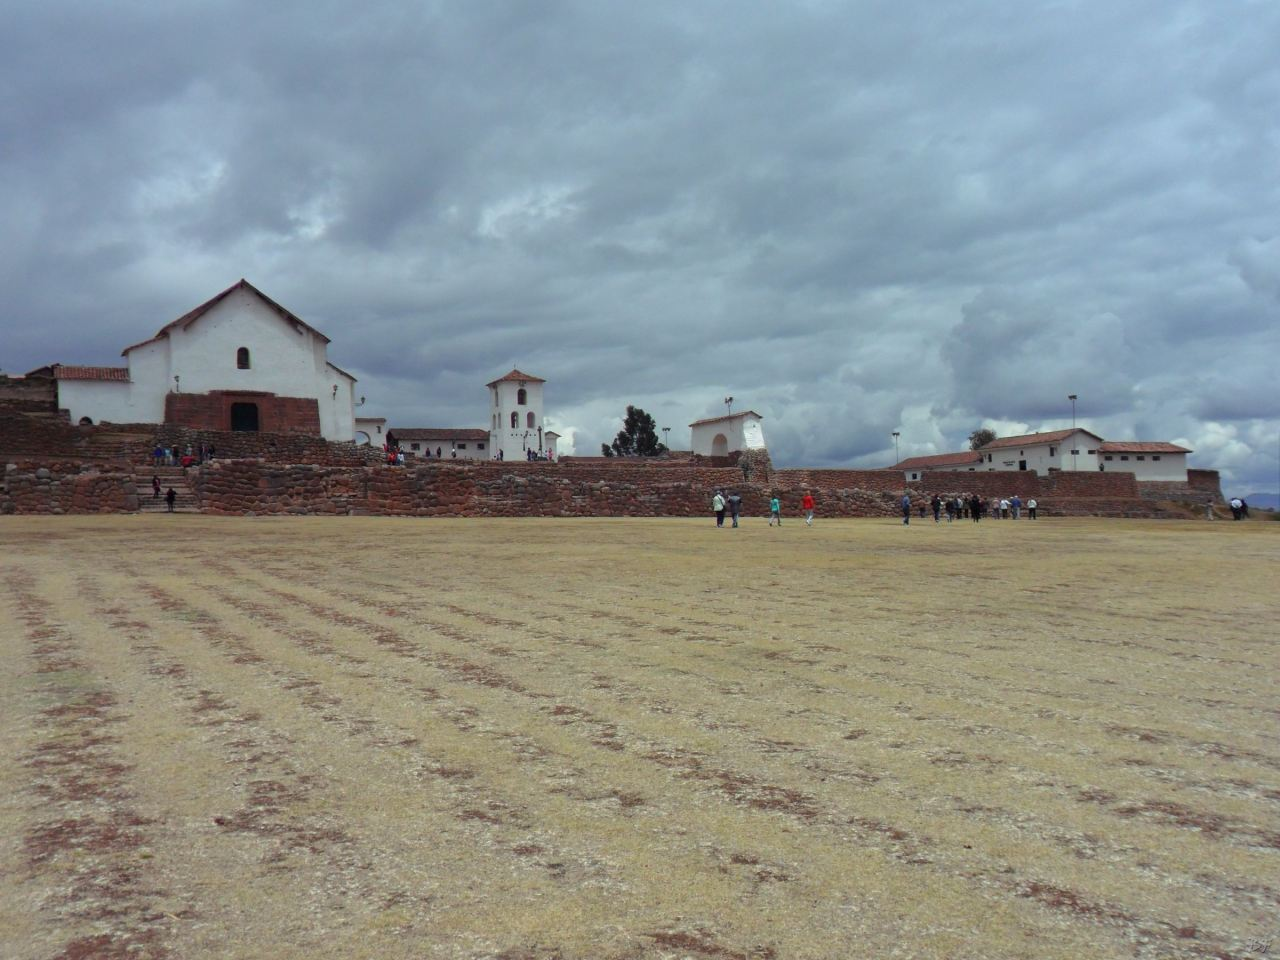 Chinchero-Mura-Poligonali-Piramide-Urubamba-Peru-3